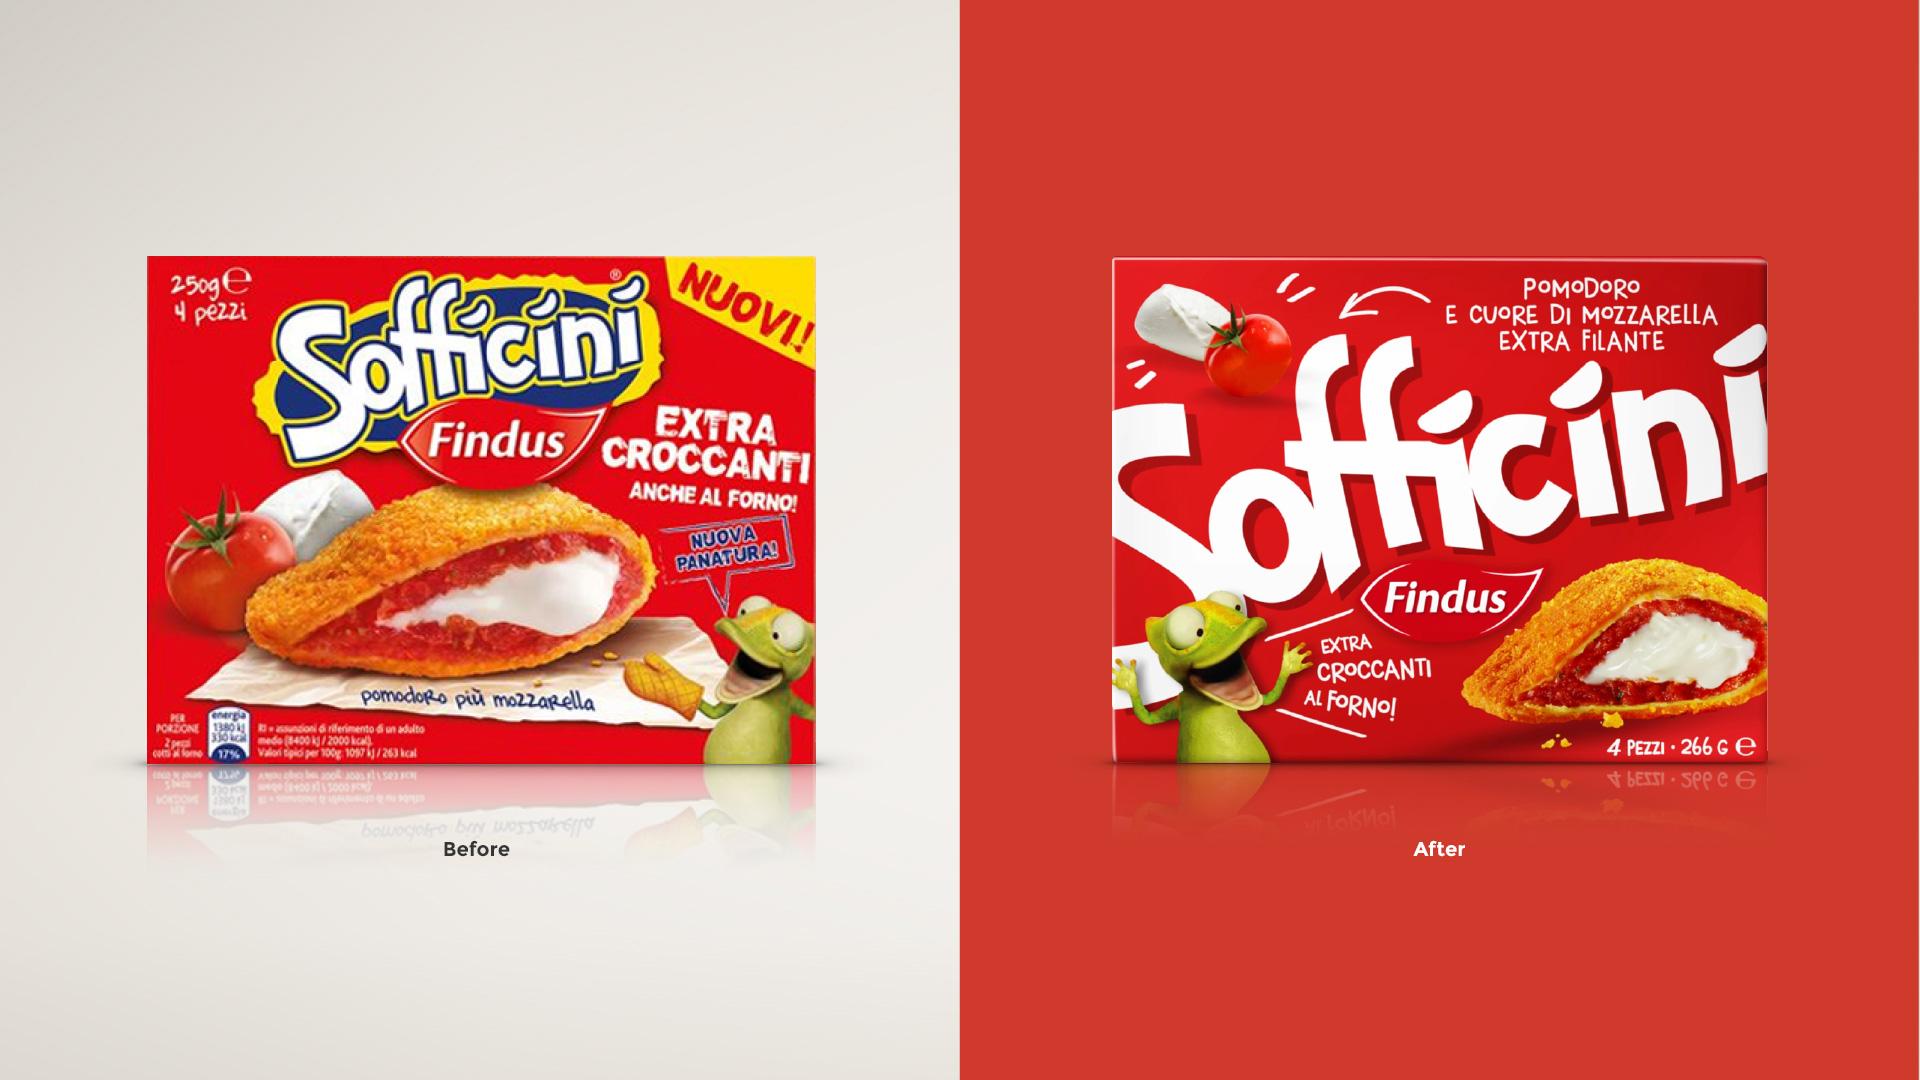 Sofficini-Findus-Rba-Design-002